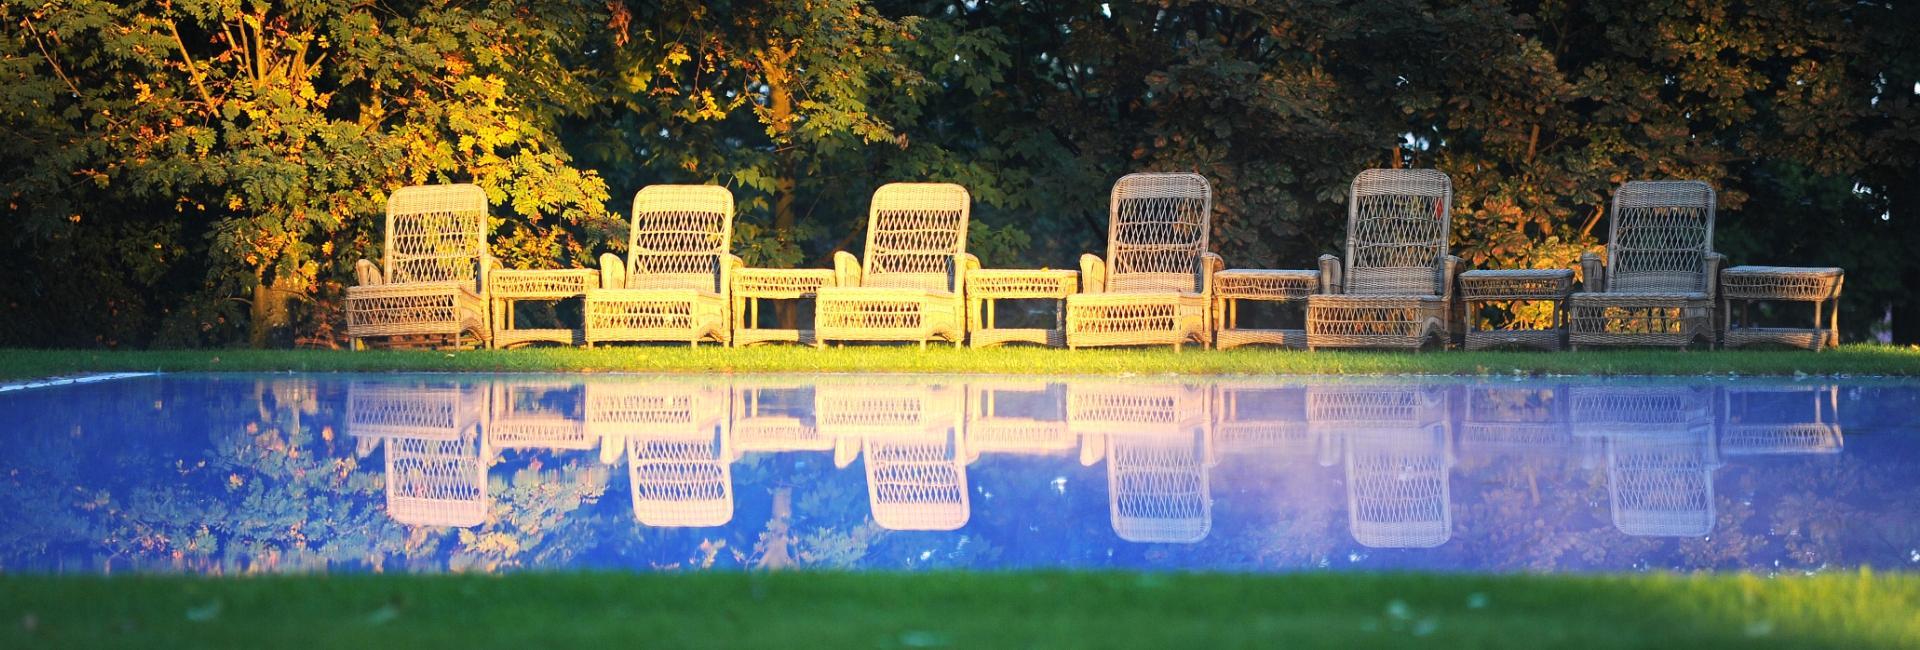 Pool at Pacoltowo Palace, Poland